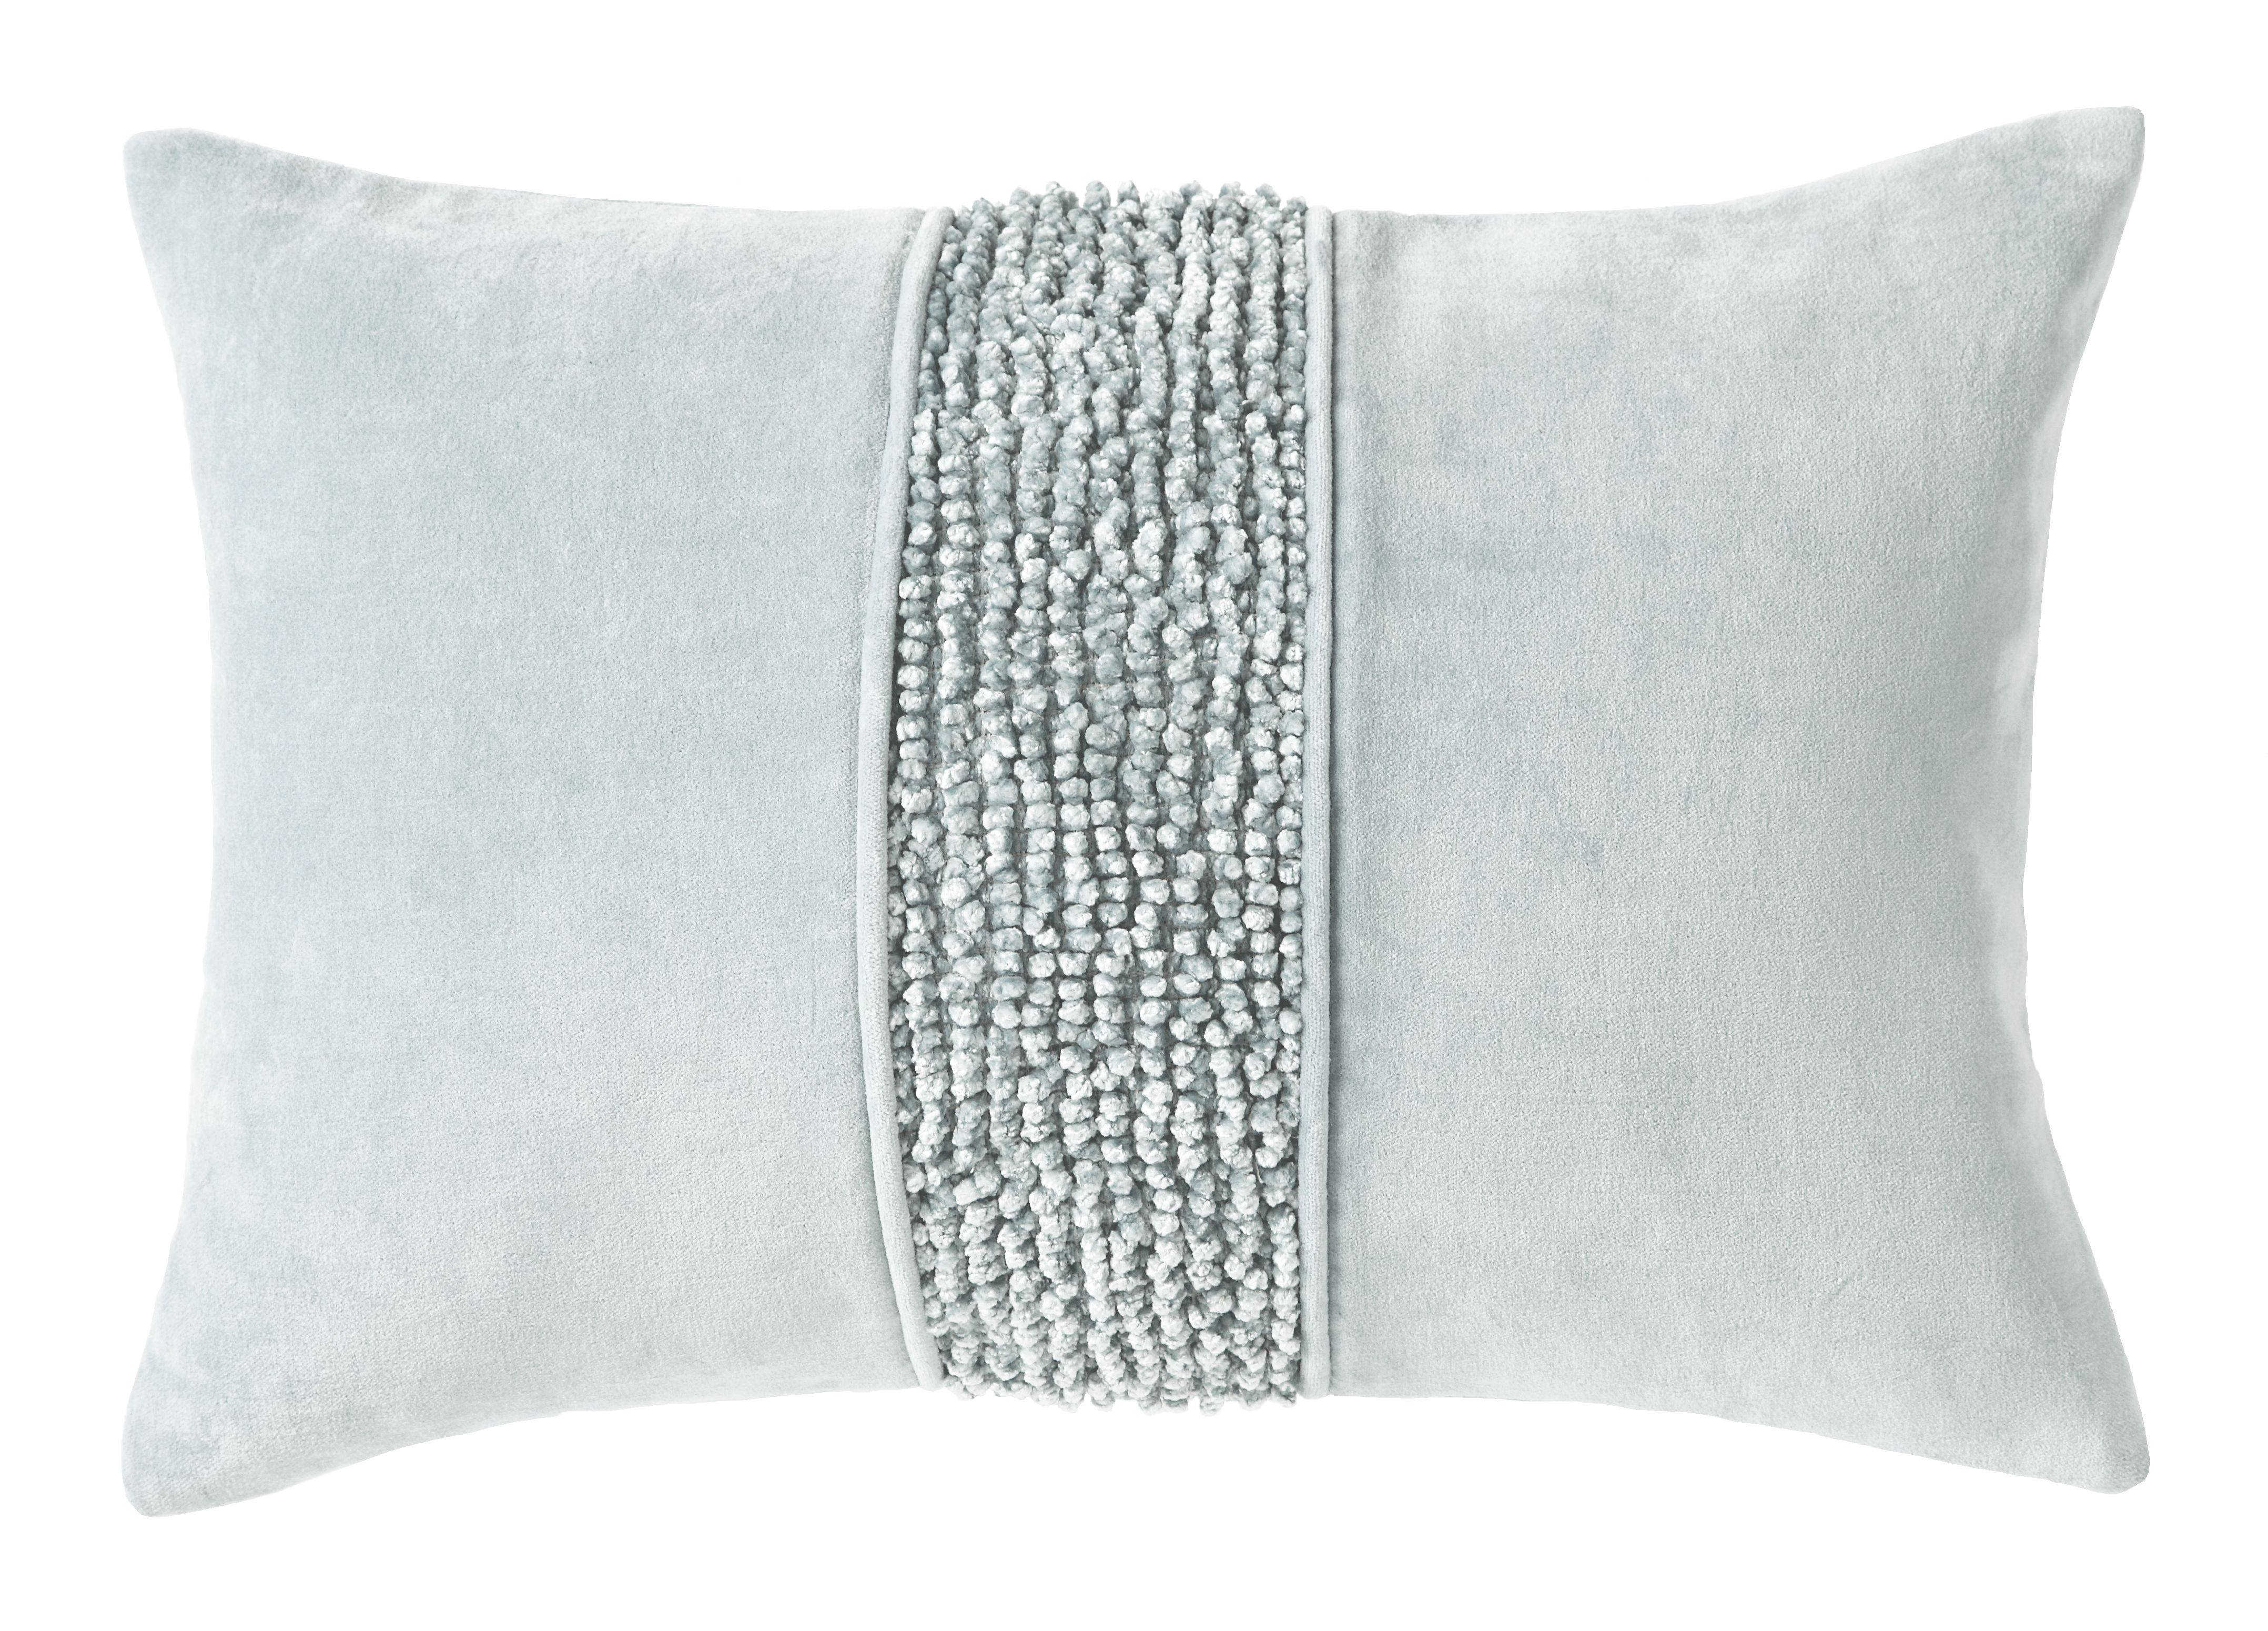 Topaz Pillow Pewter Pillows Stylish Pillows Velvet Pillows